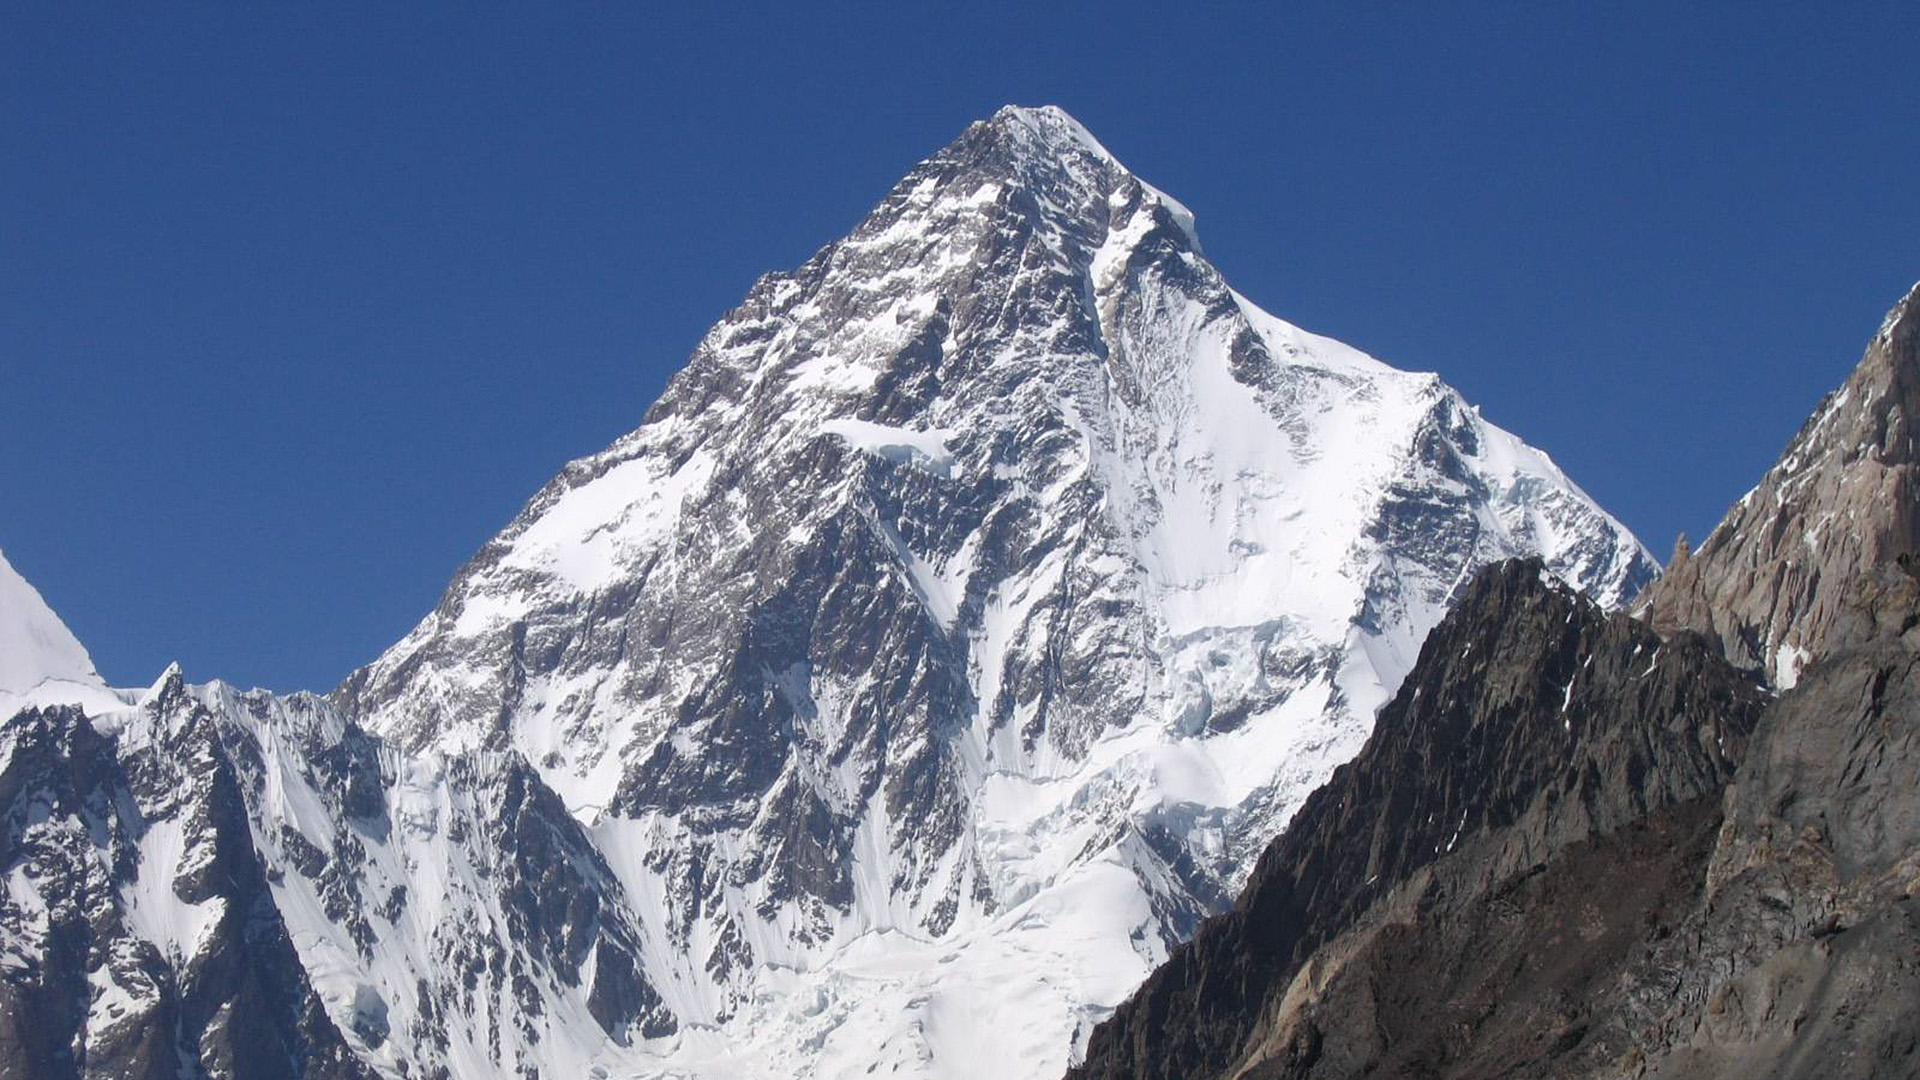 Bodies Of Three Climbers Including Pakistan's Muhammad Ali Sadpara Found On K2